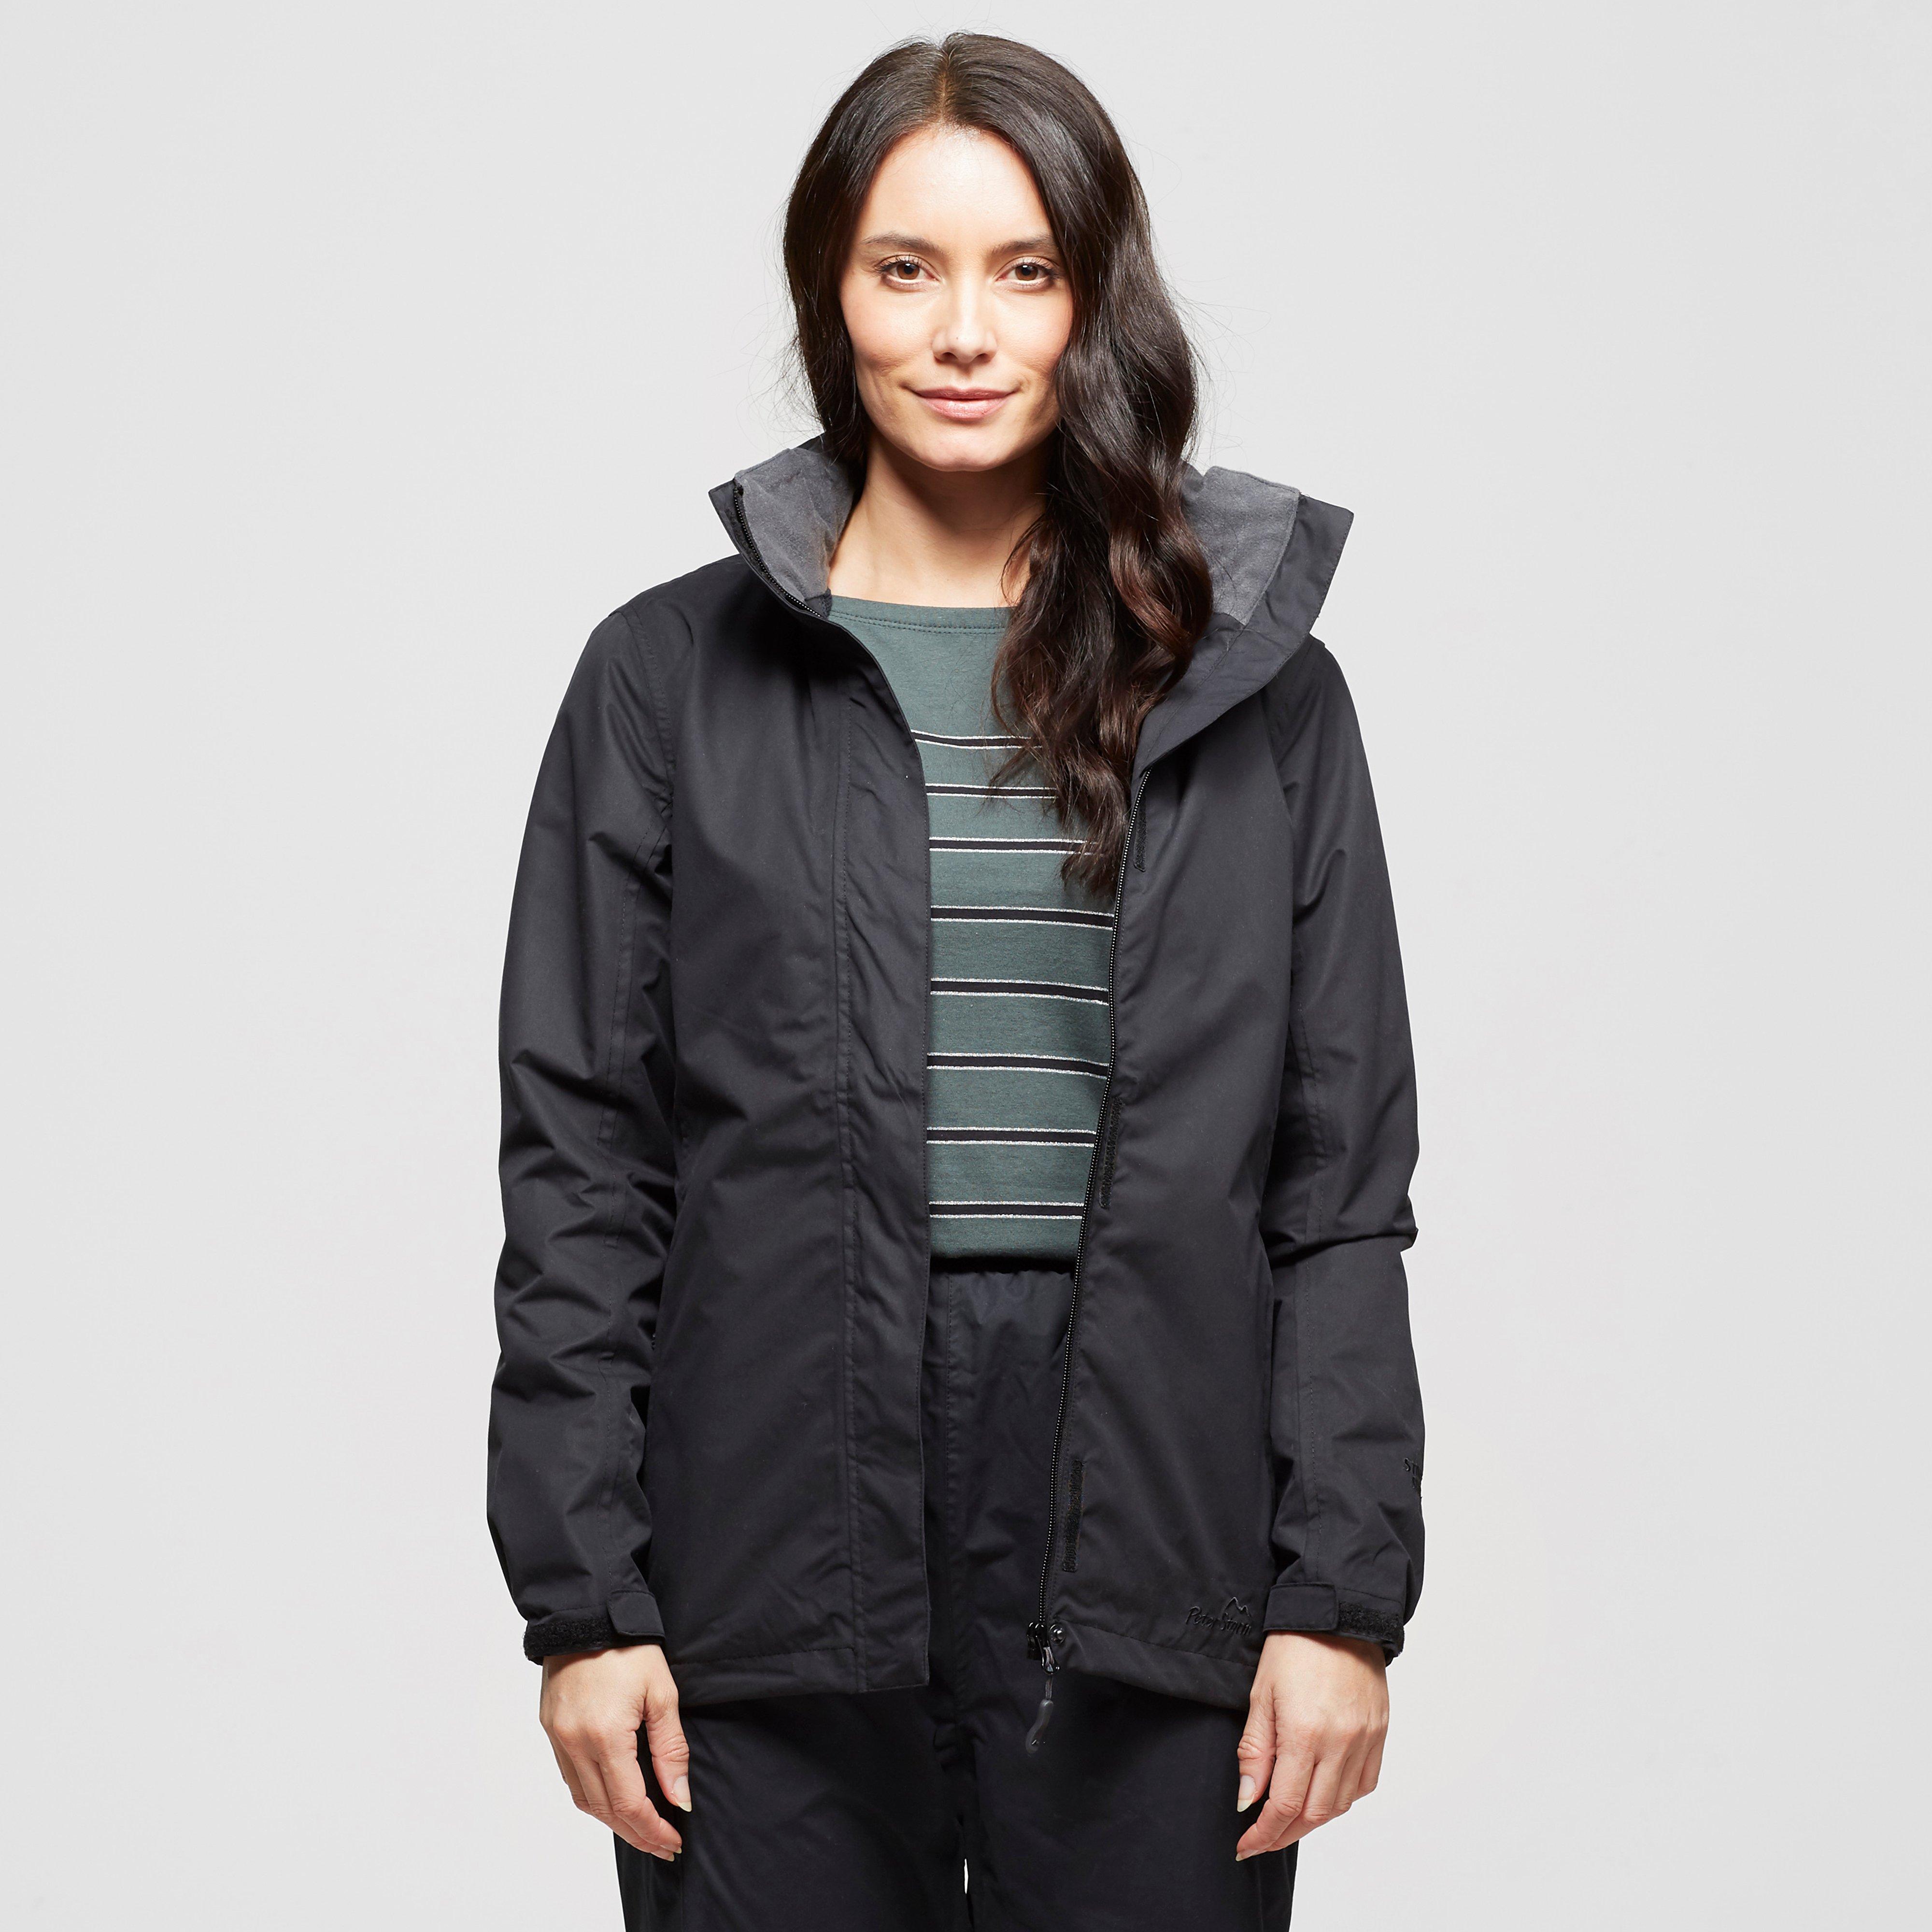 Peter Storm Peter Storm womens Downpour Waterproof Jacket - Black, Black